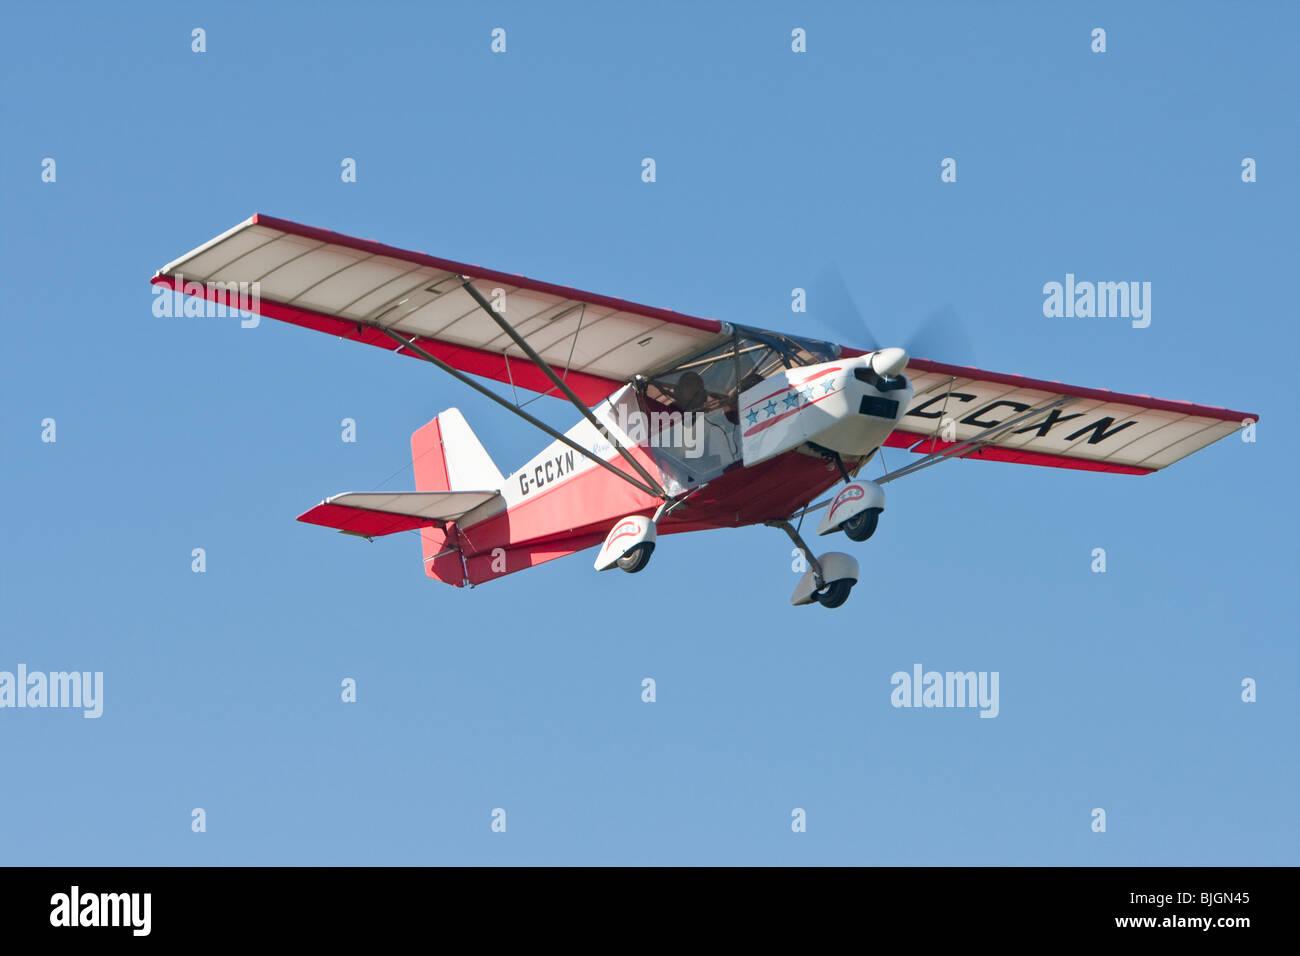 Chegwen CI Skyranger 912 microlight, at Breighton - Stock Image